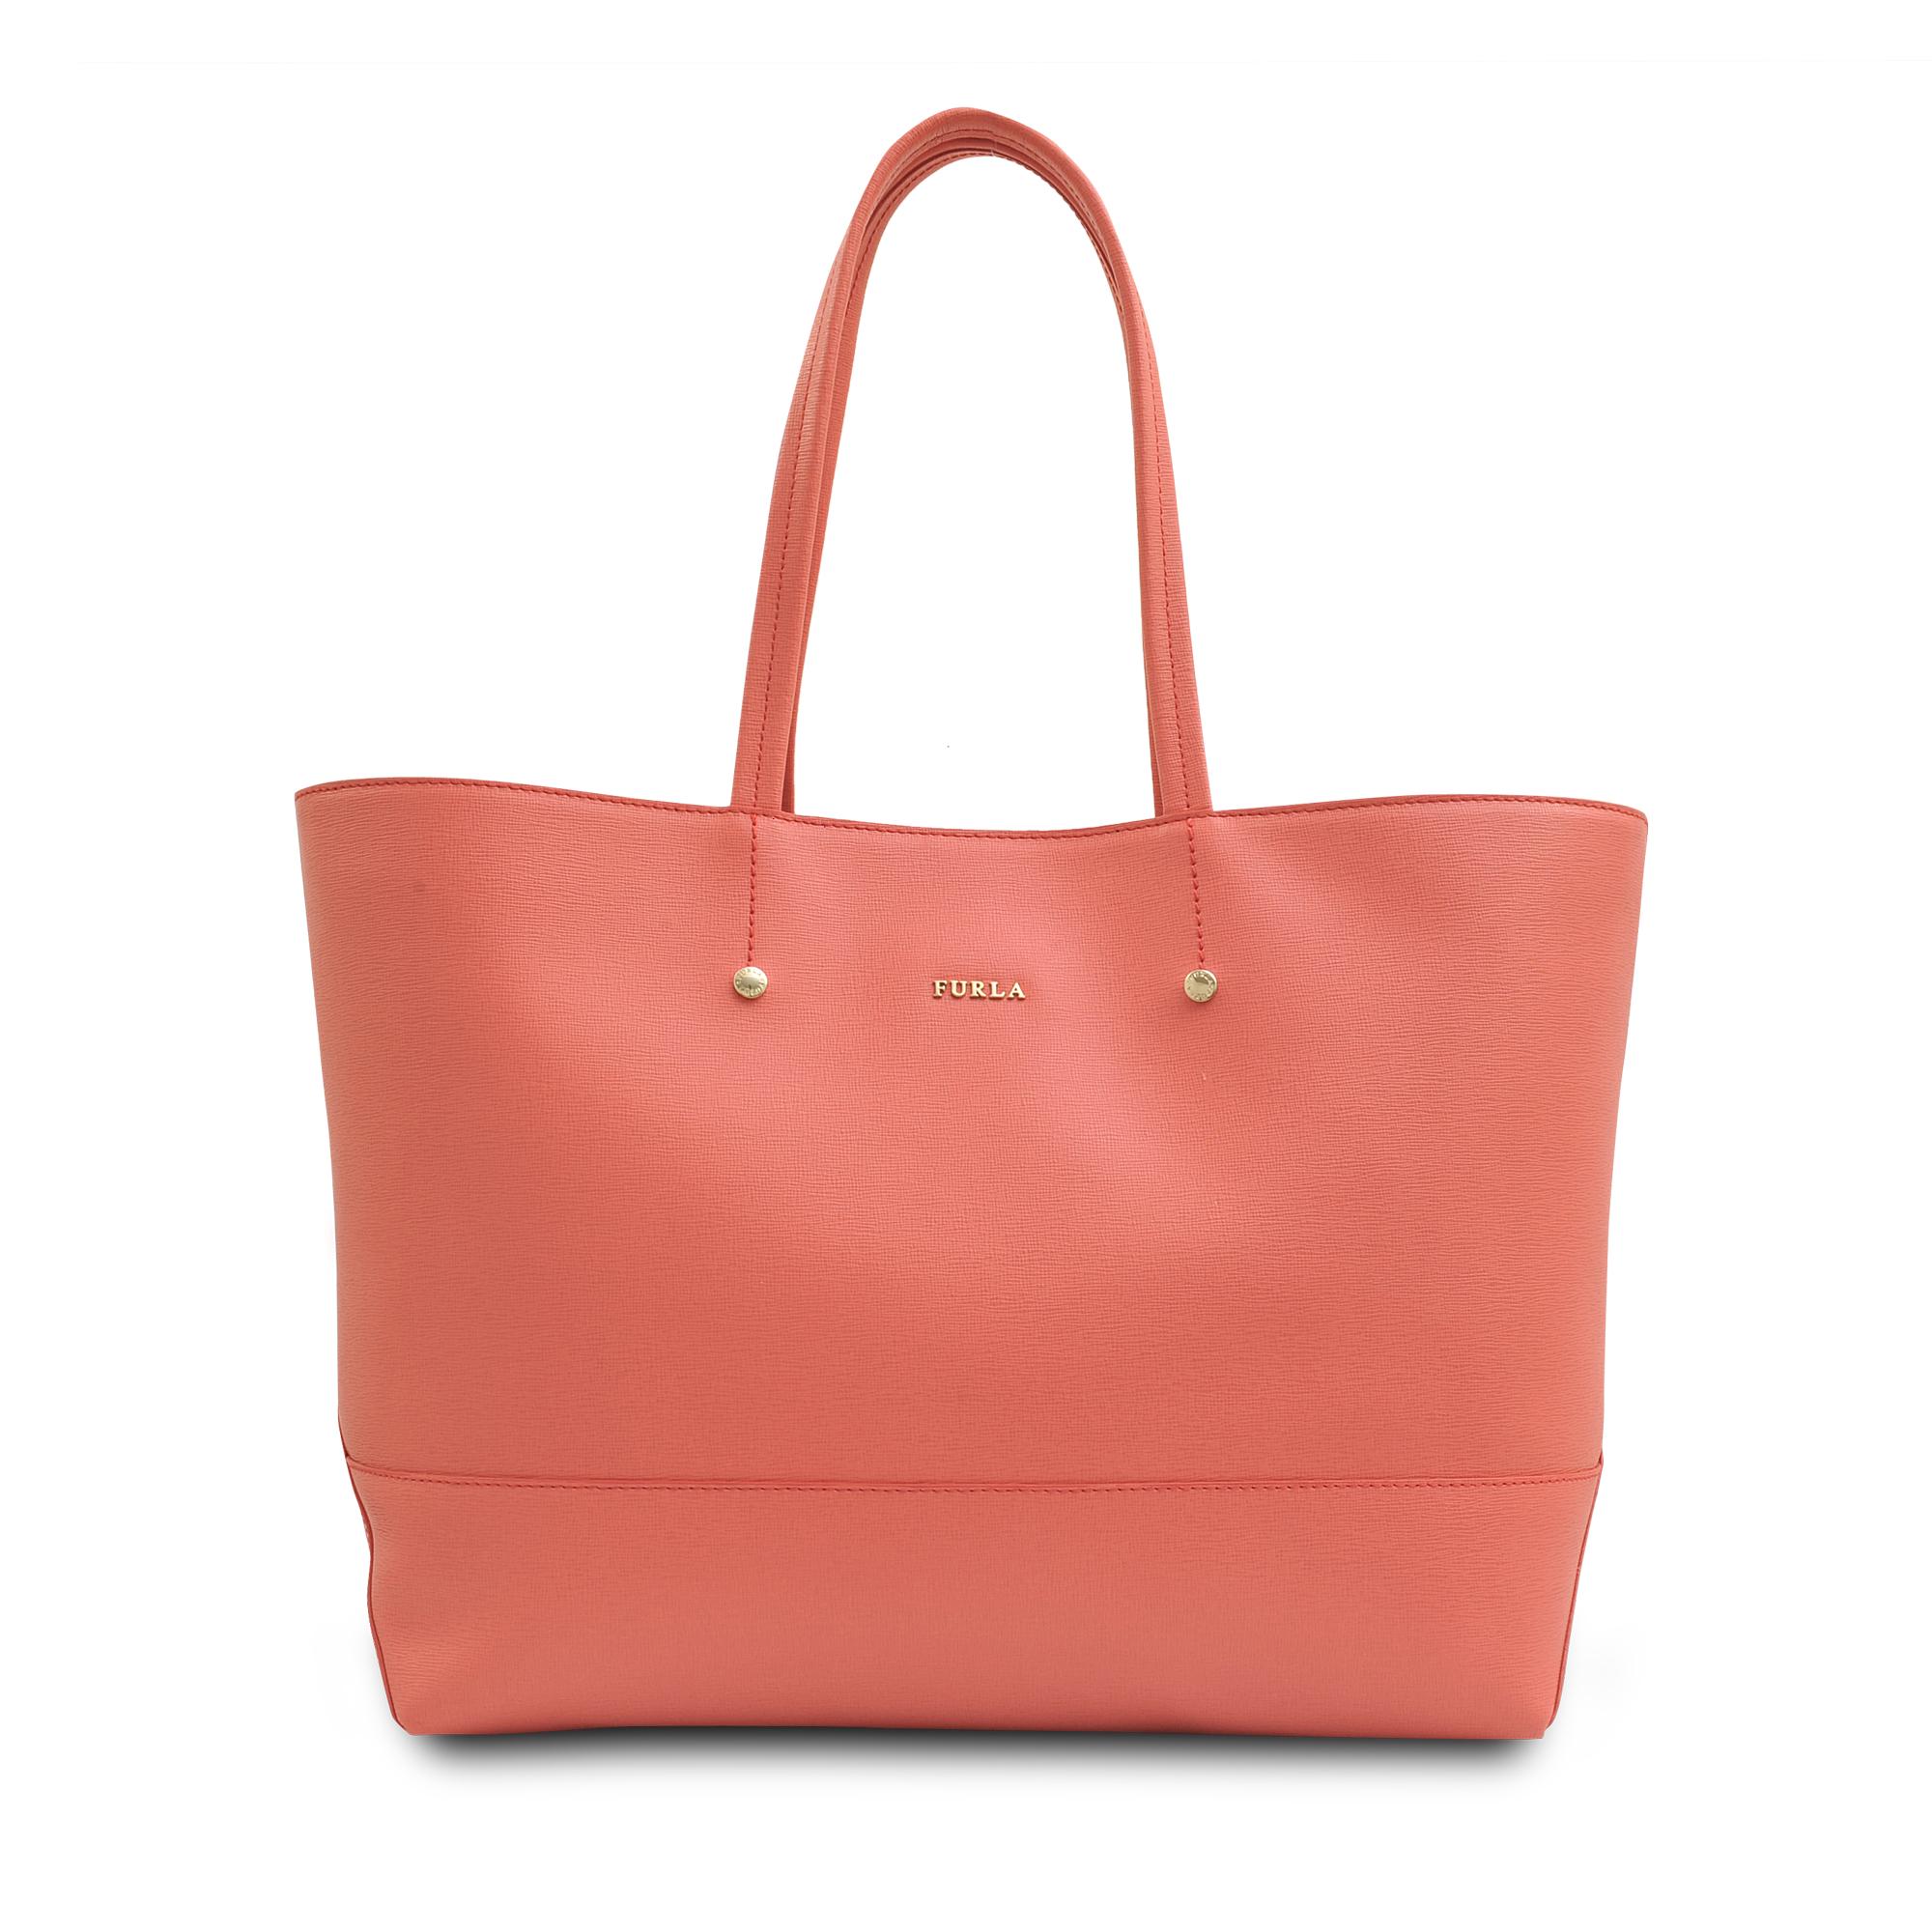 furla melissa medium saffiano tote bag in pink lyst. Black Bedroom Furniture Sets. Home Design Ideas